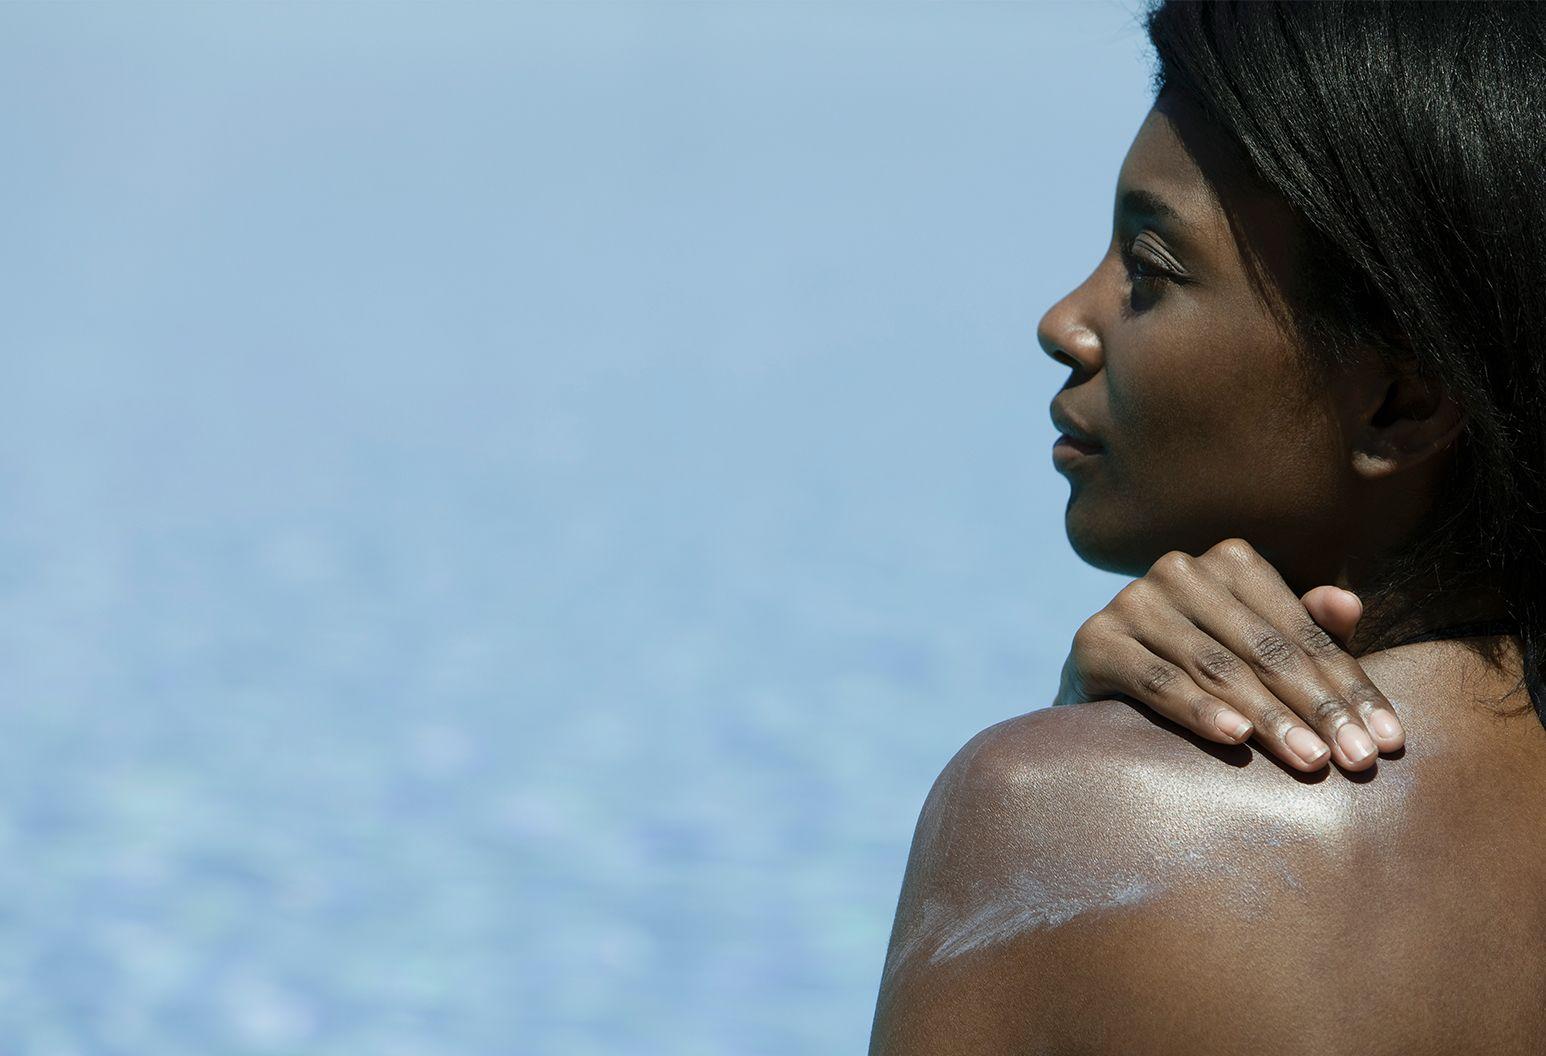 Does Dark Skin Protect Against Skin Cancer